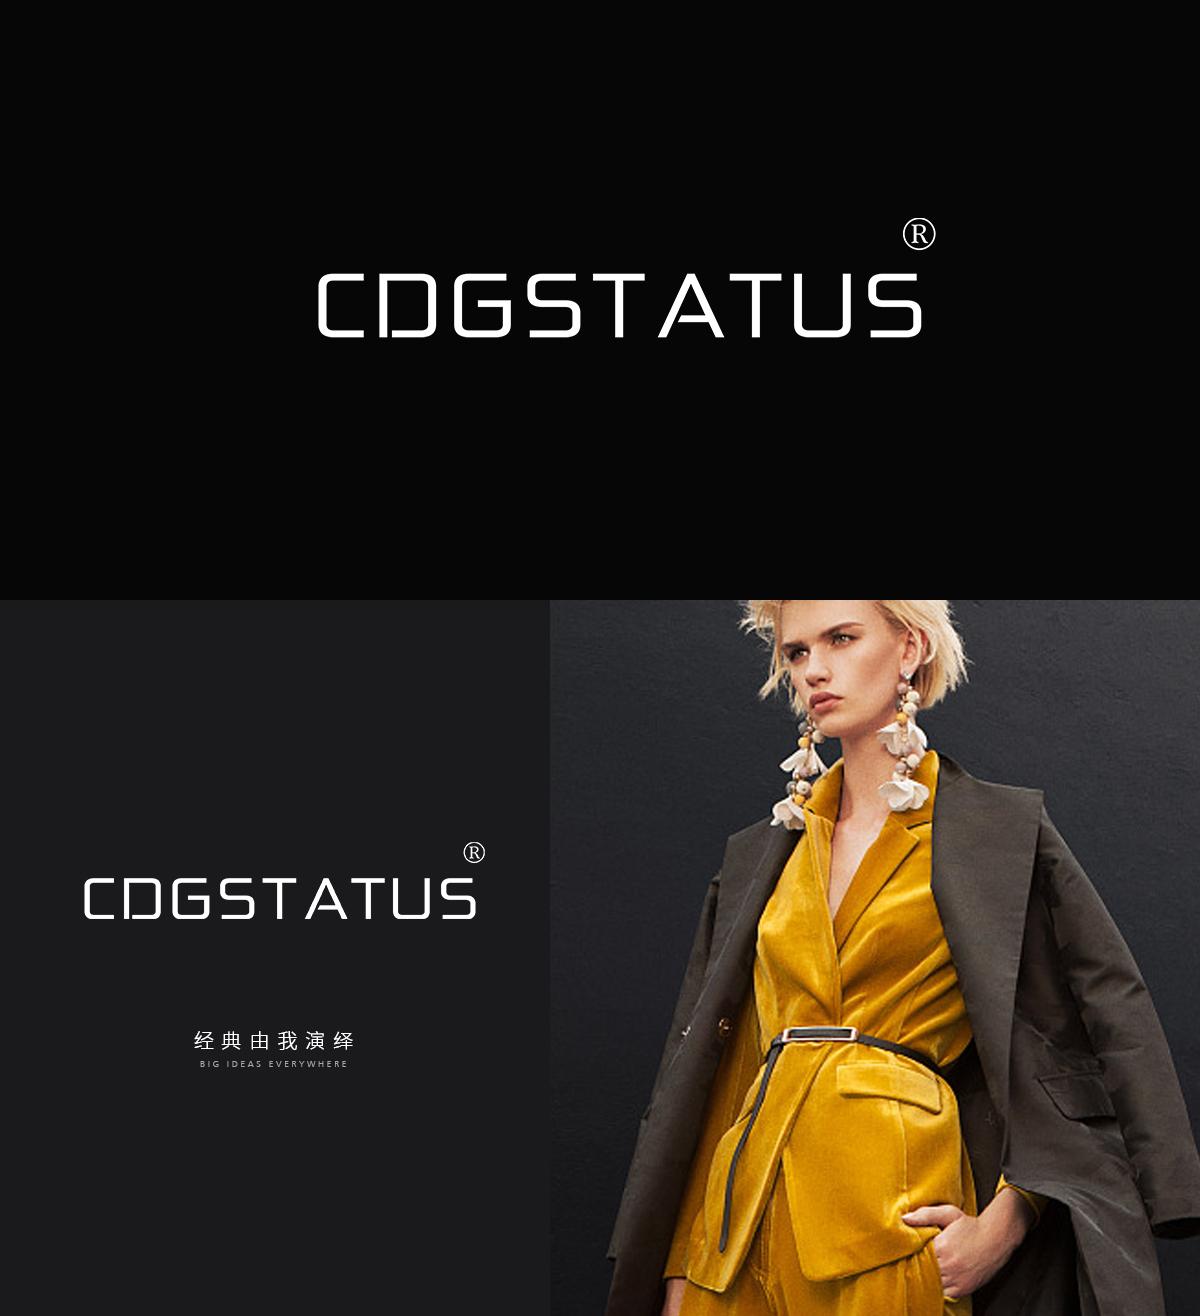 CDGSTATUS